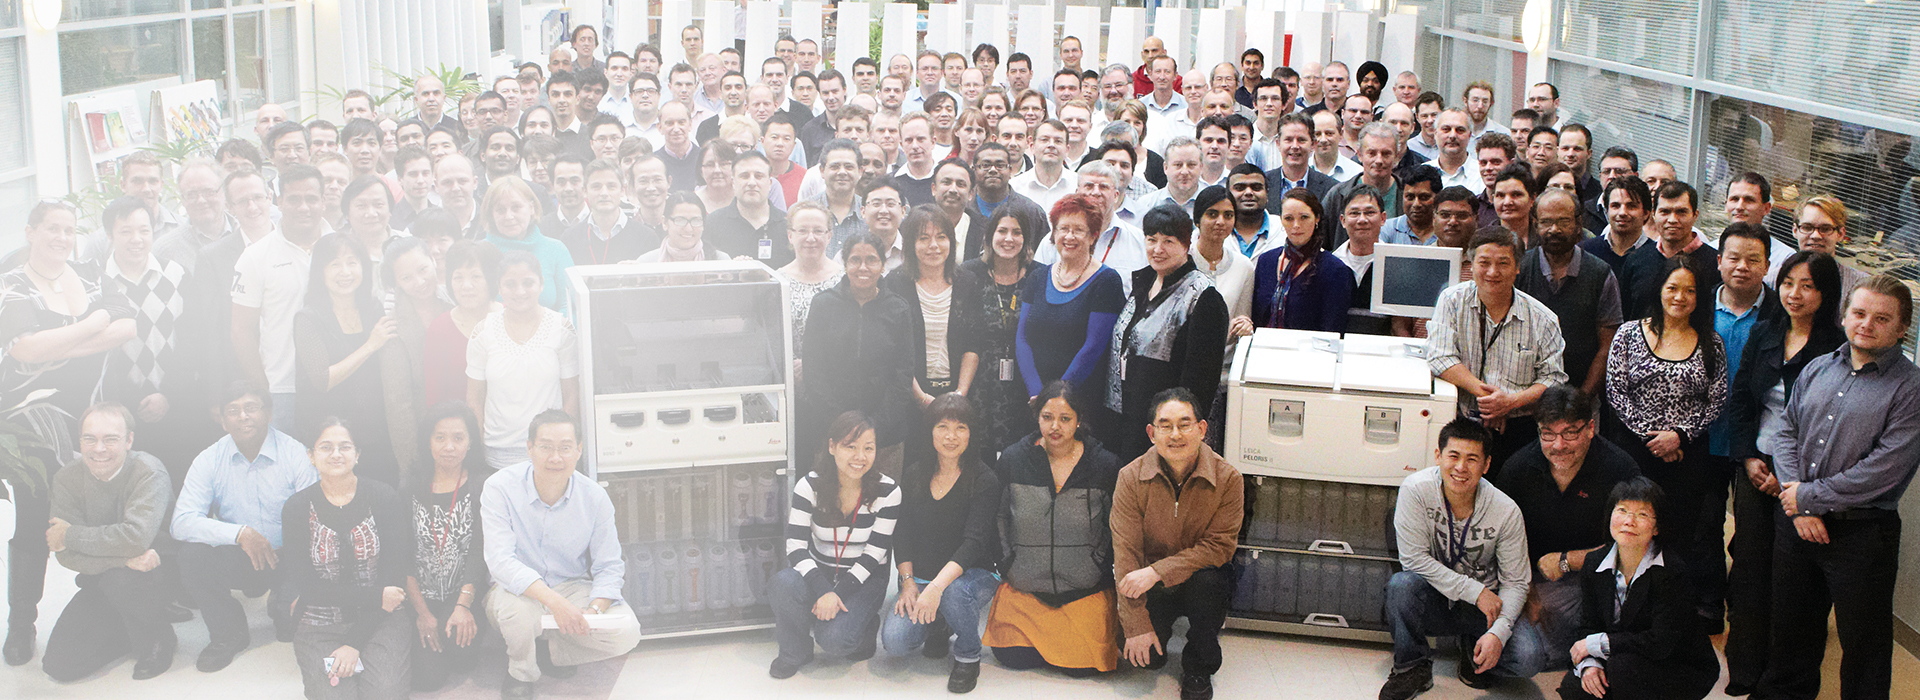 Photograph of Leica Biosystems associates in company square